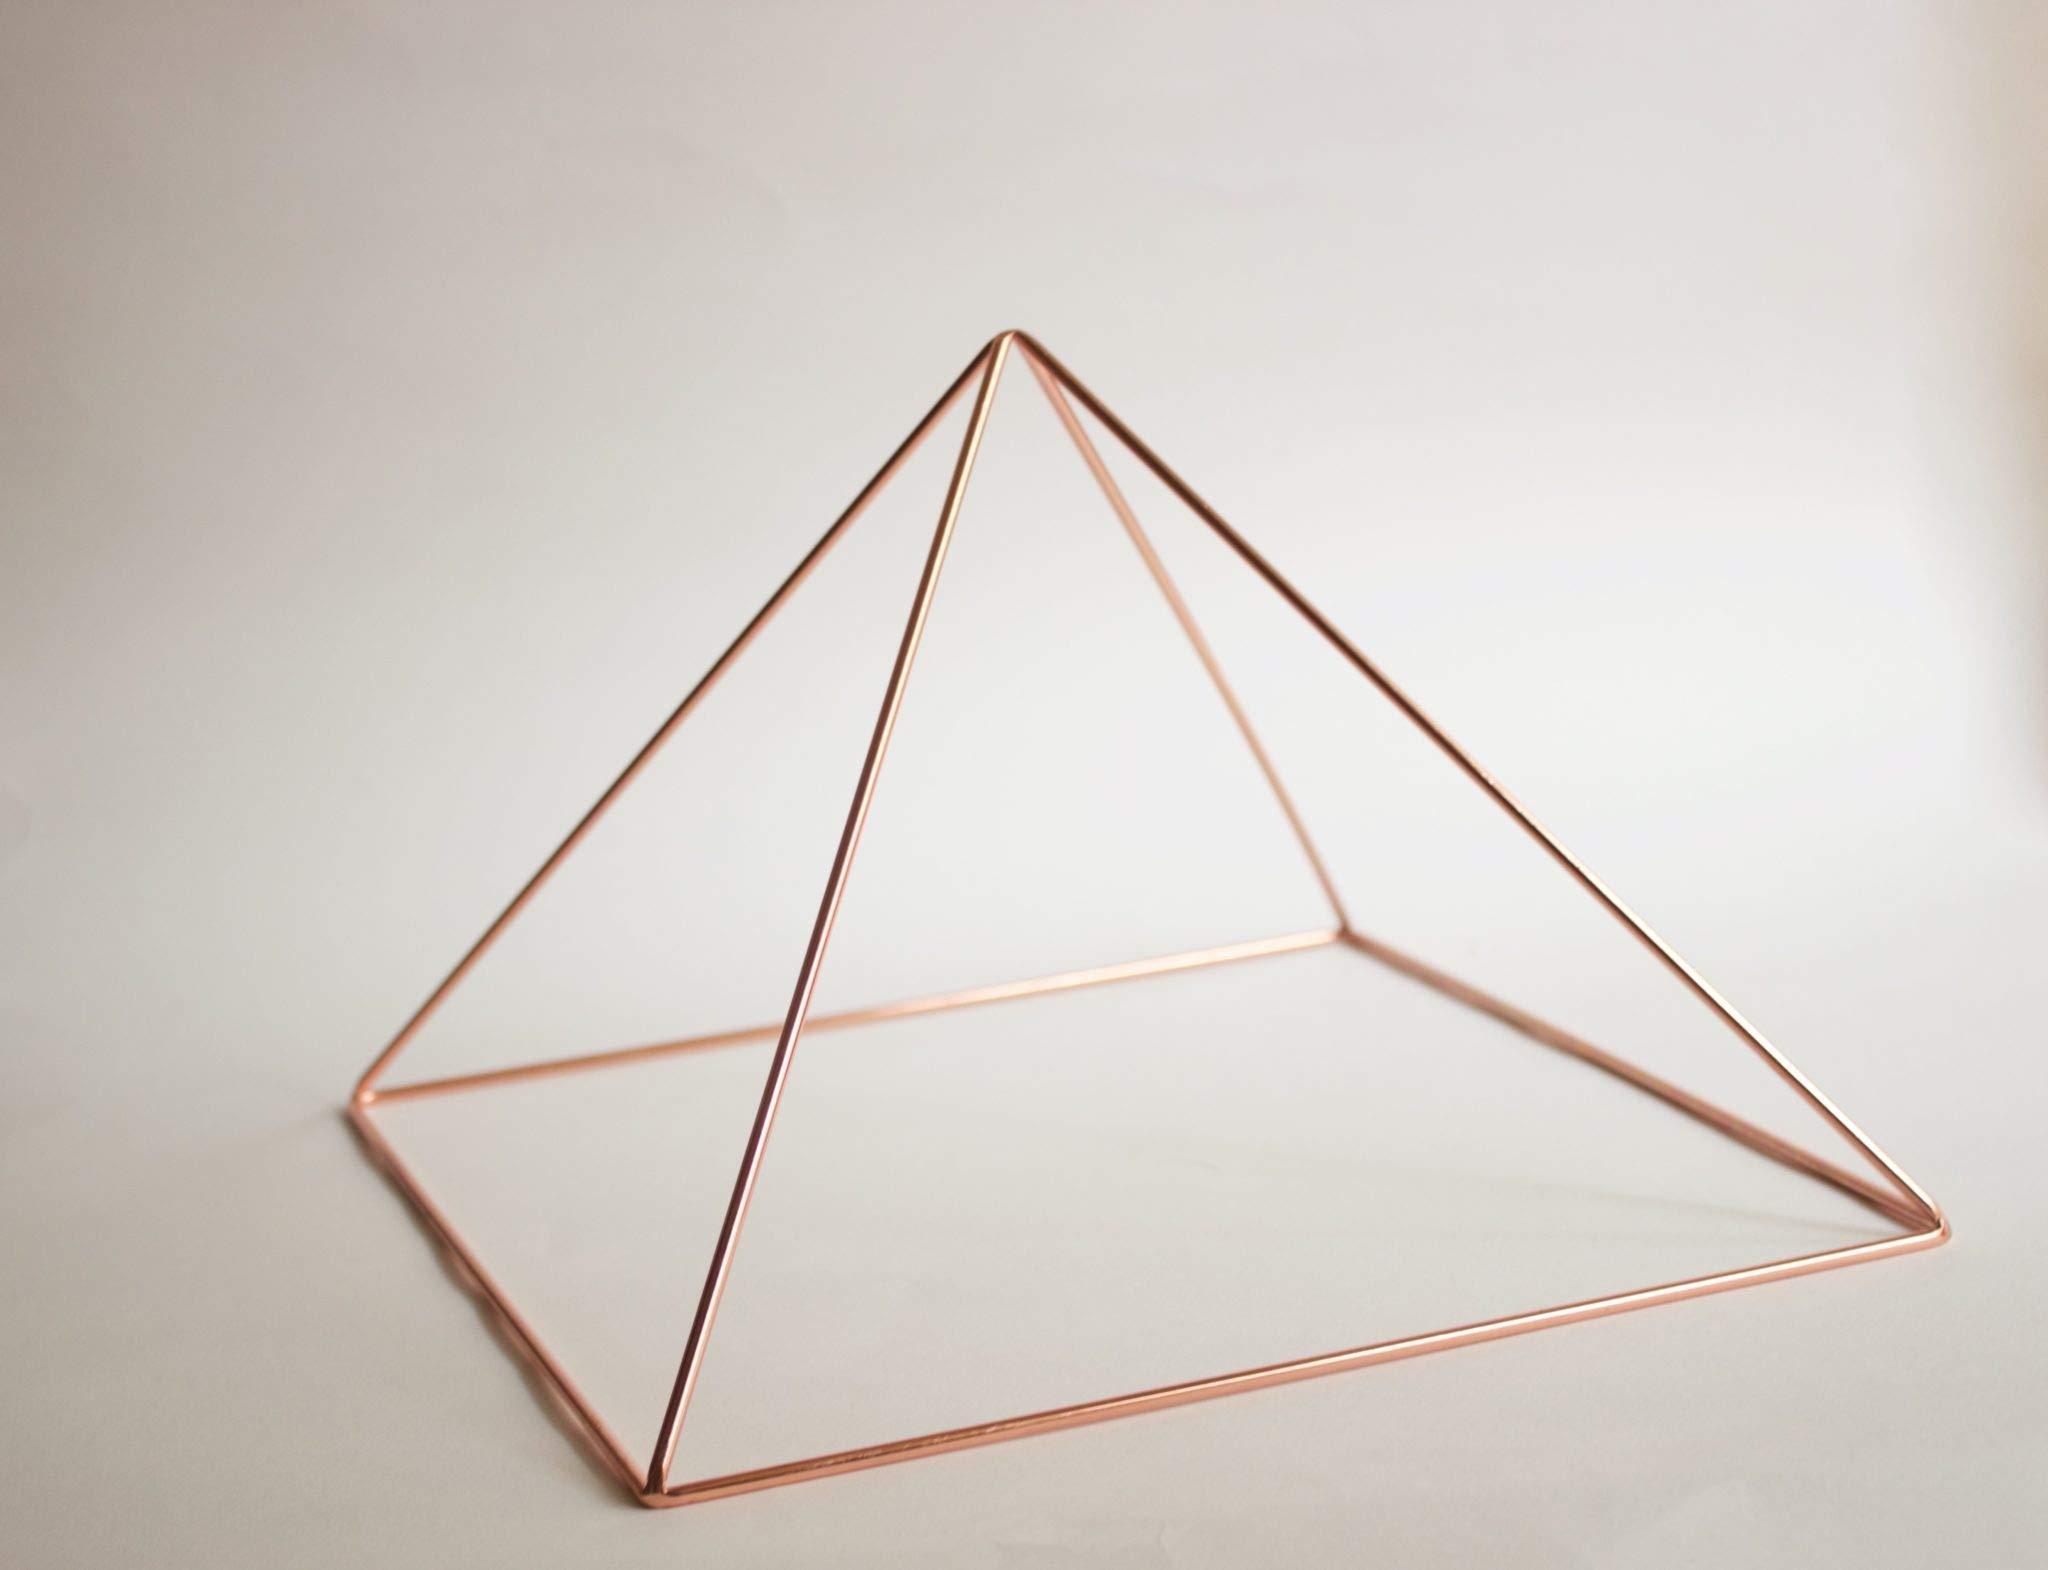 12 inch Copper Tabletop Pyramid Giza Style